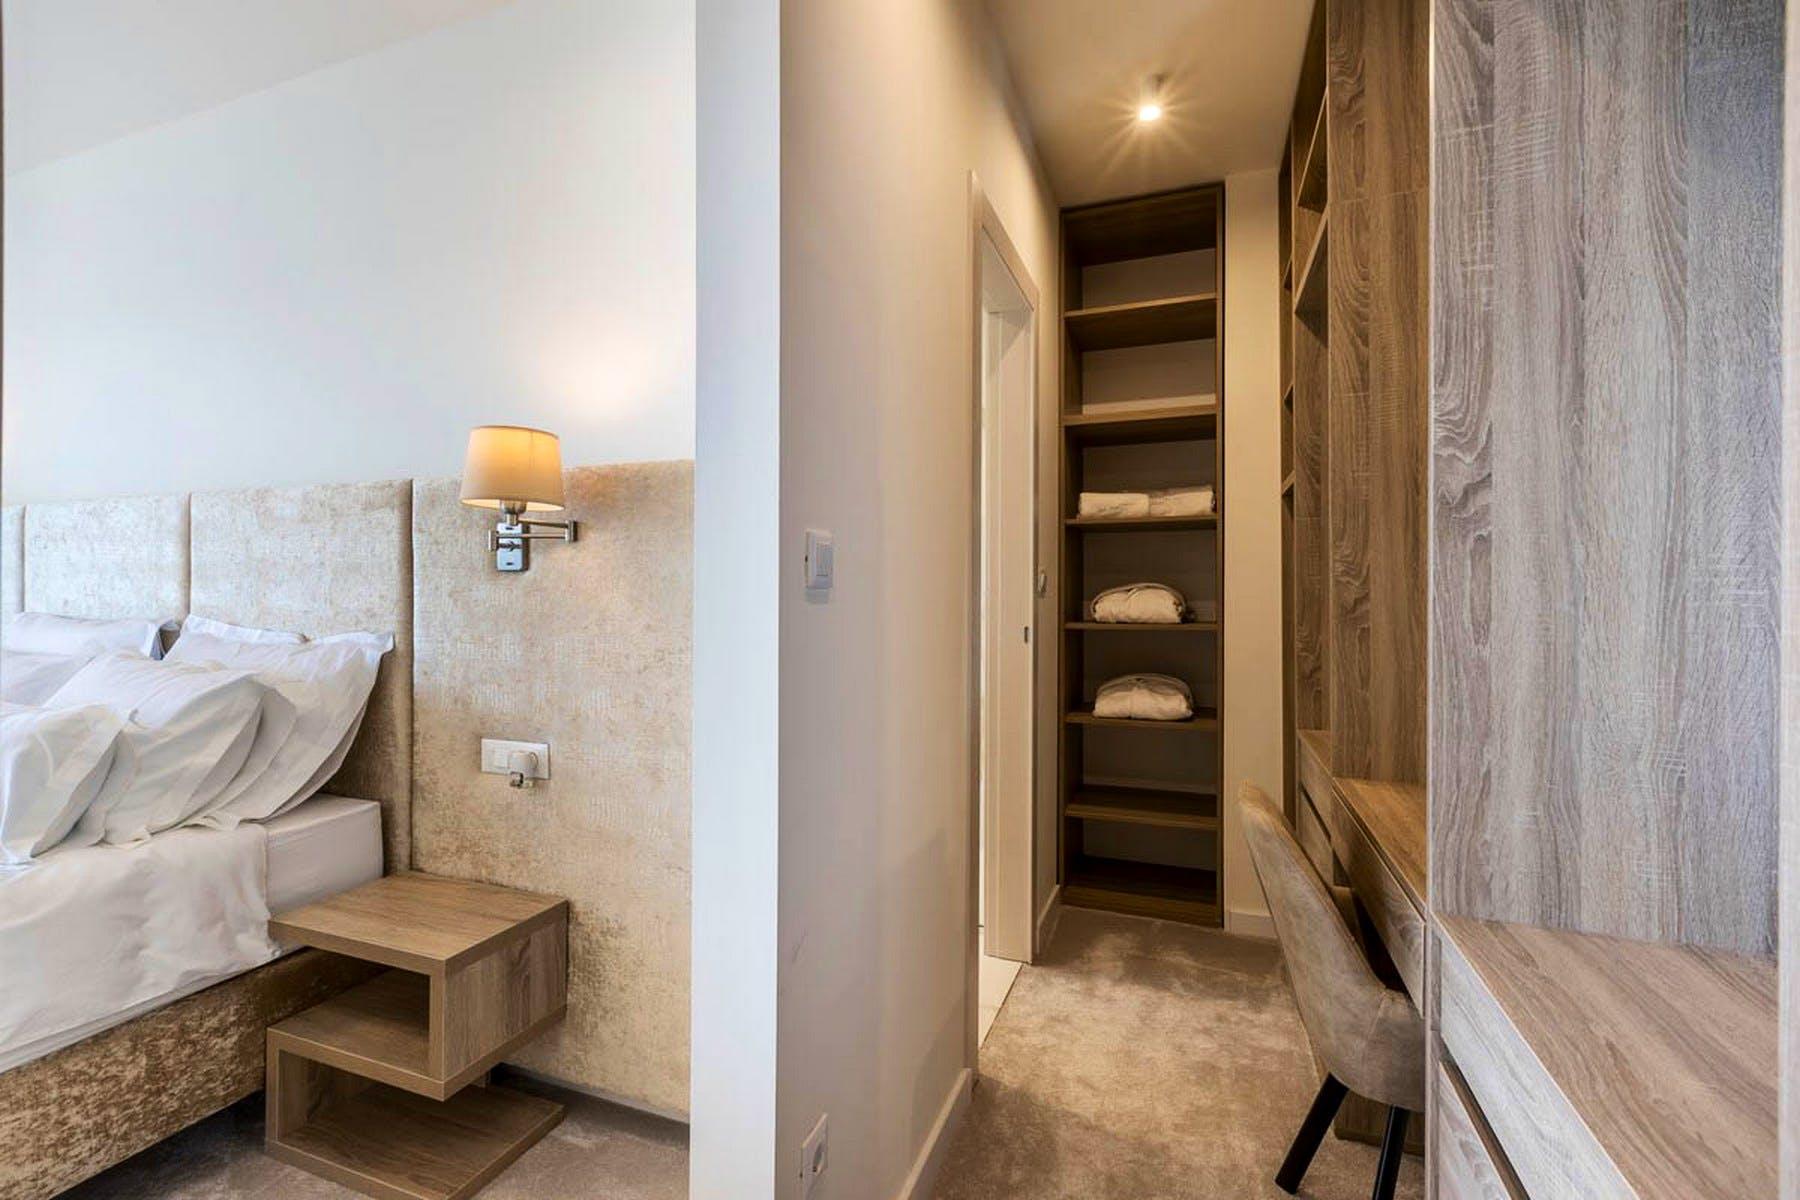 Passage to en-suite bathroom